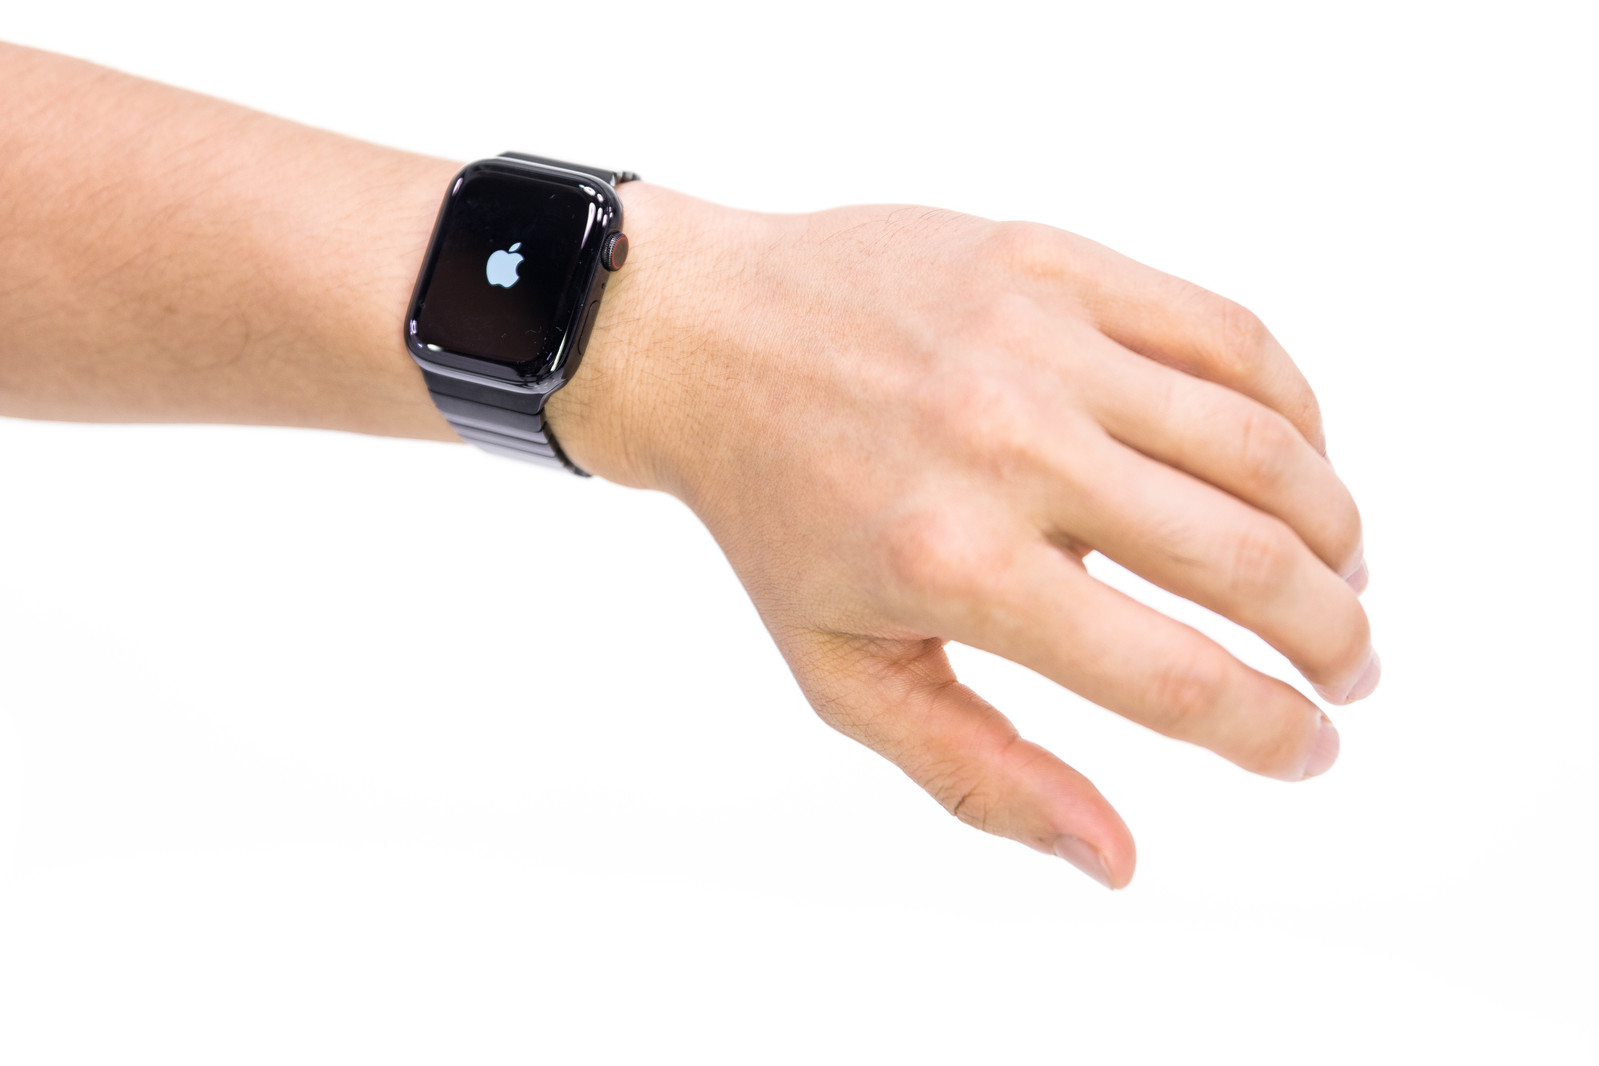 「Apple Watch Series 4 を取り付けた腕」の写真